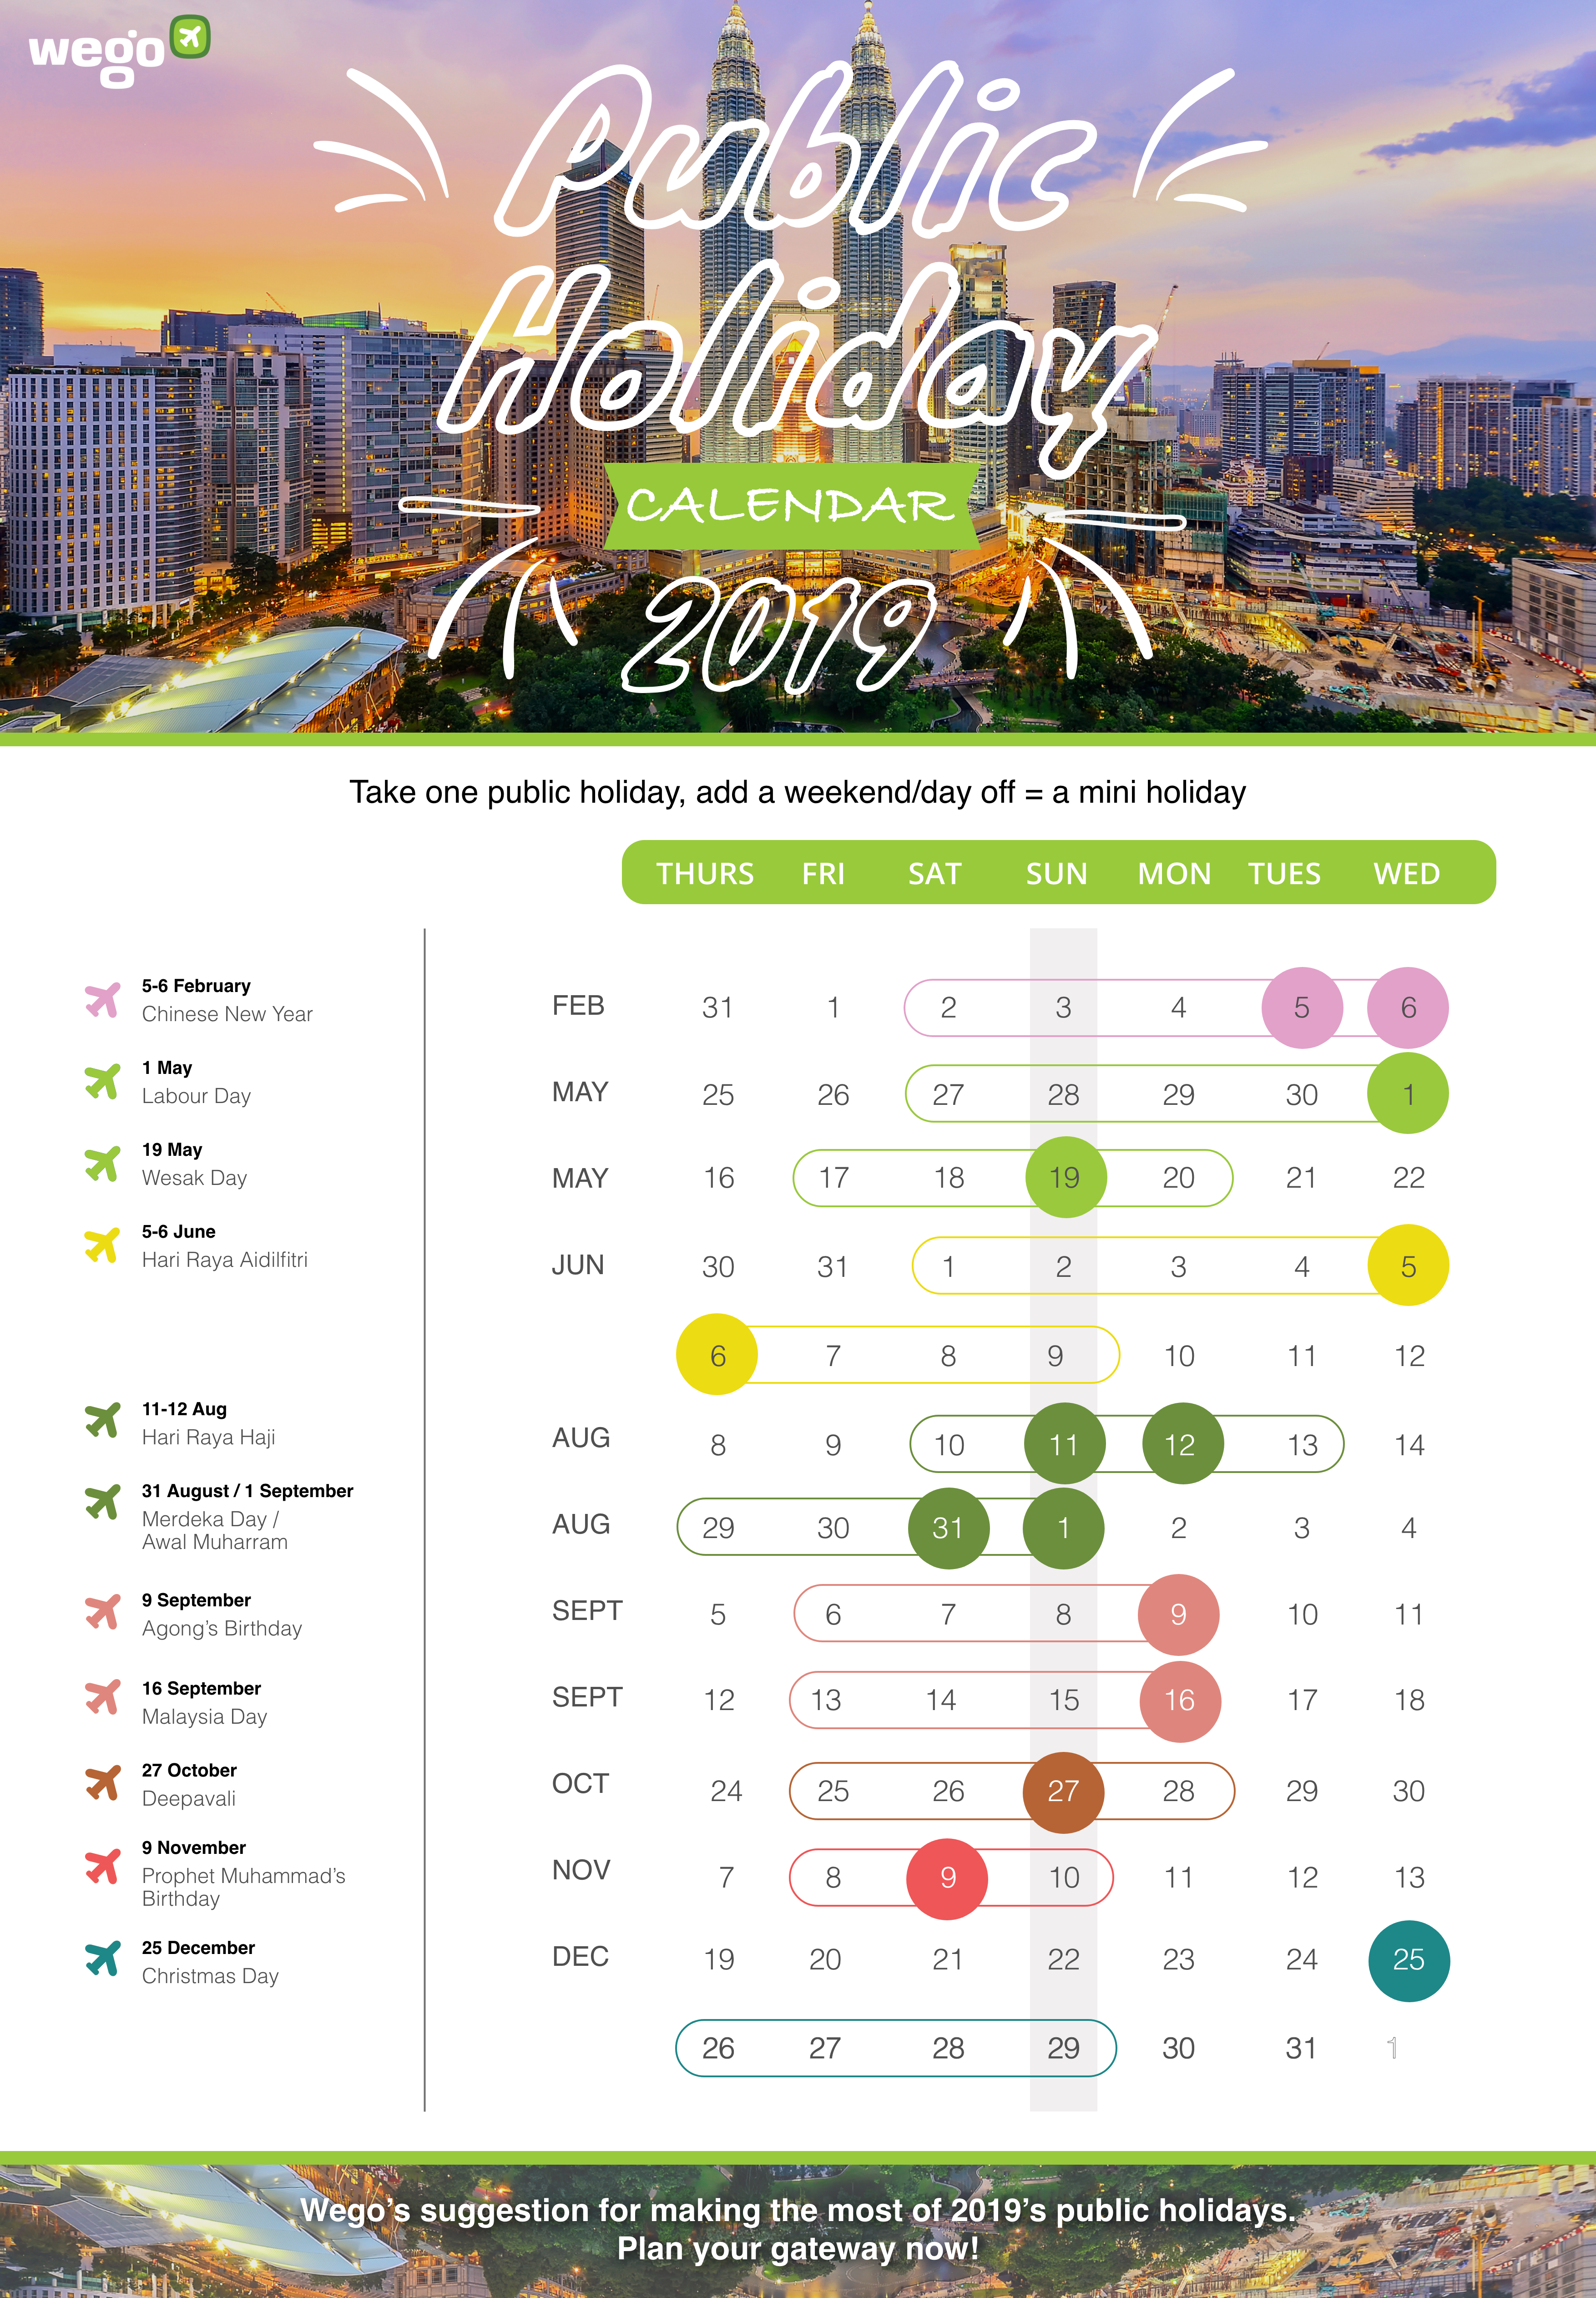 Christmas Holidays 2019 Calendar.Wego S 2019 Calendar For Public Holidays In Malaysia Wego